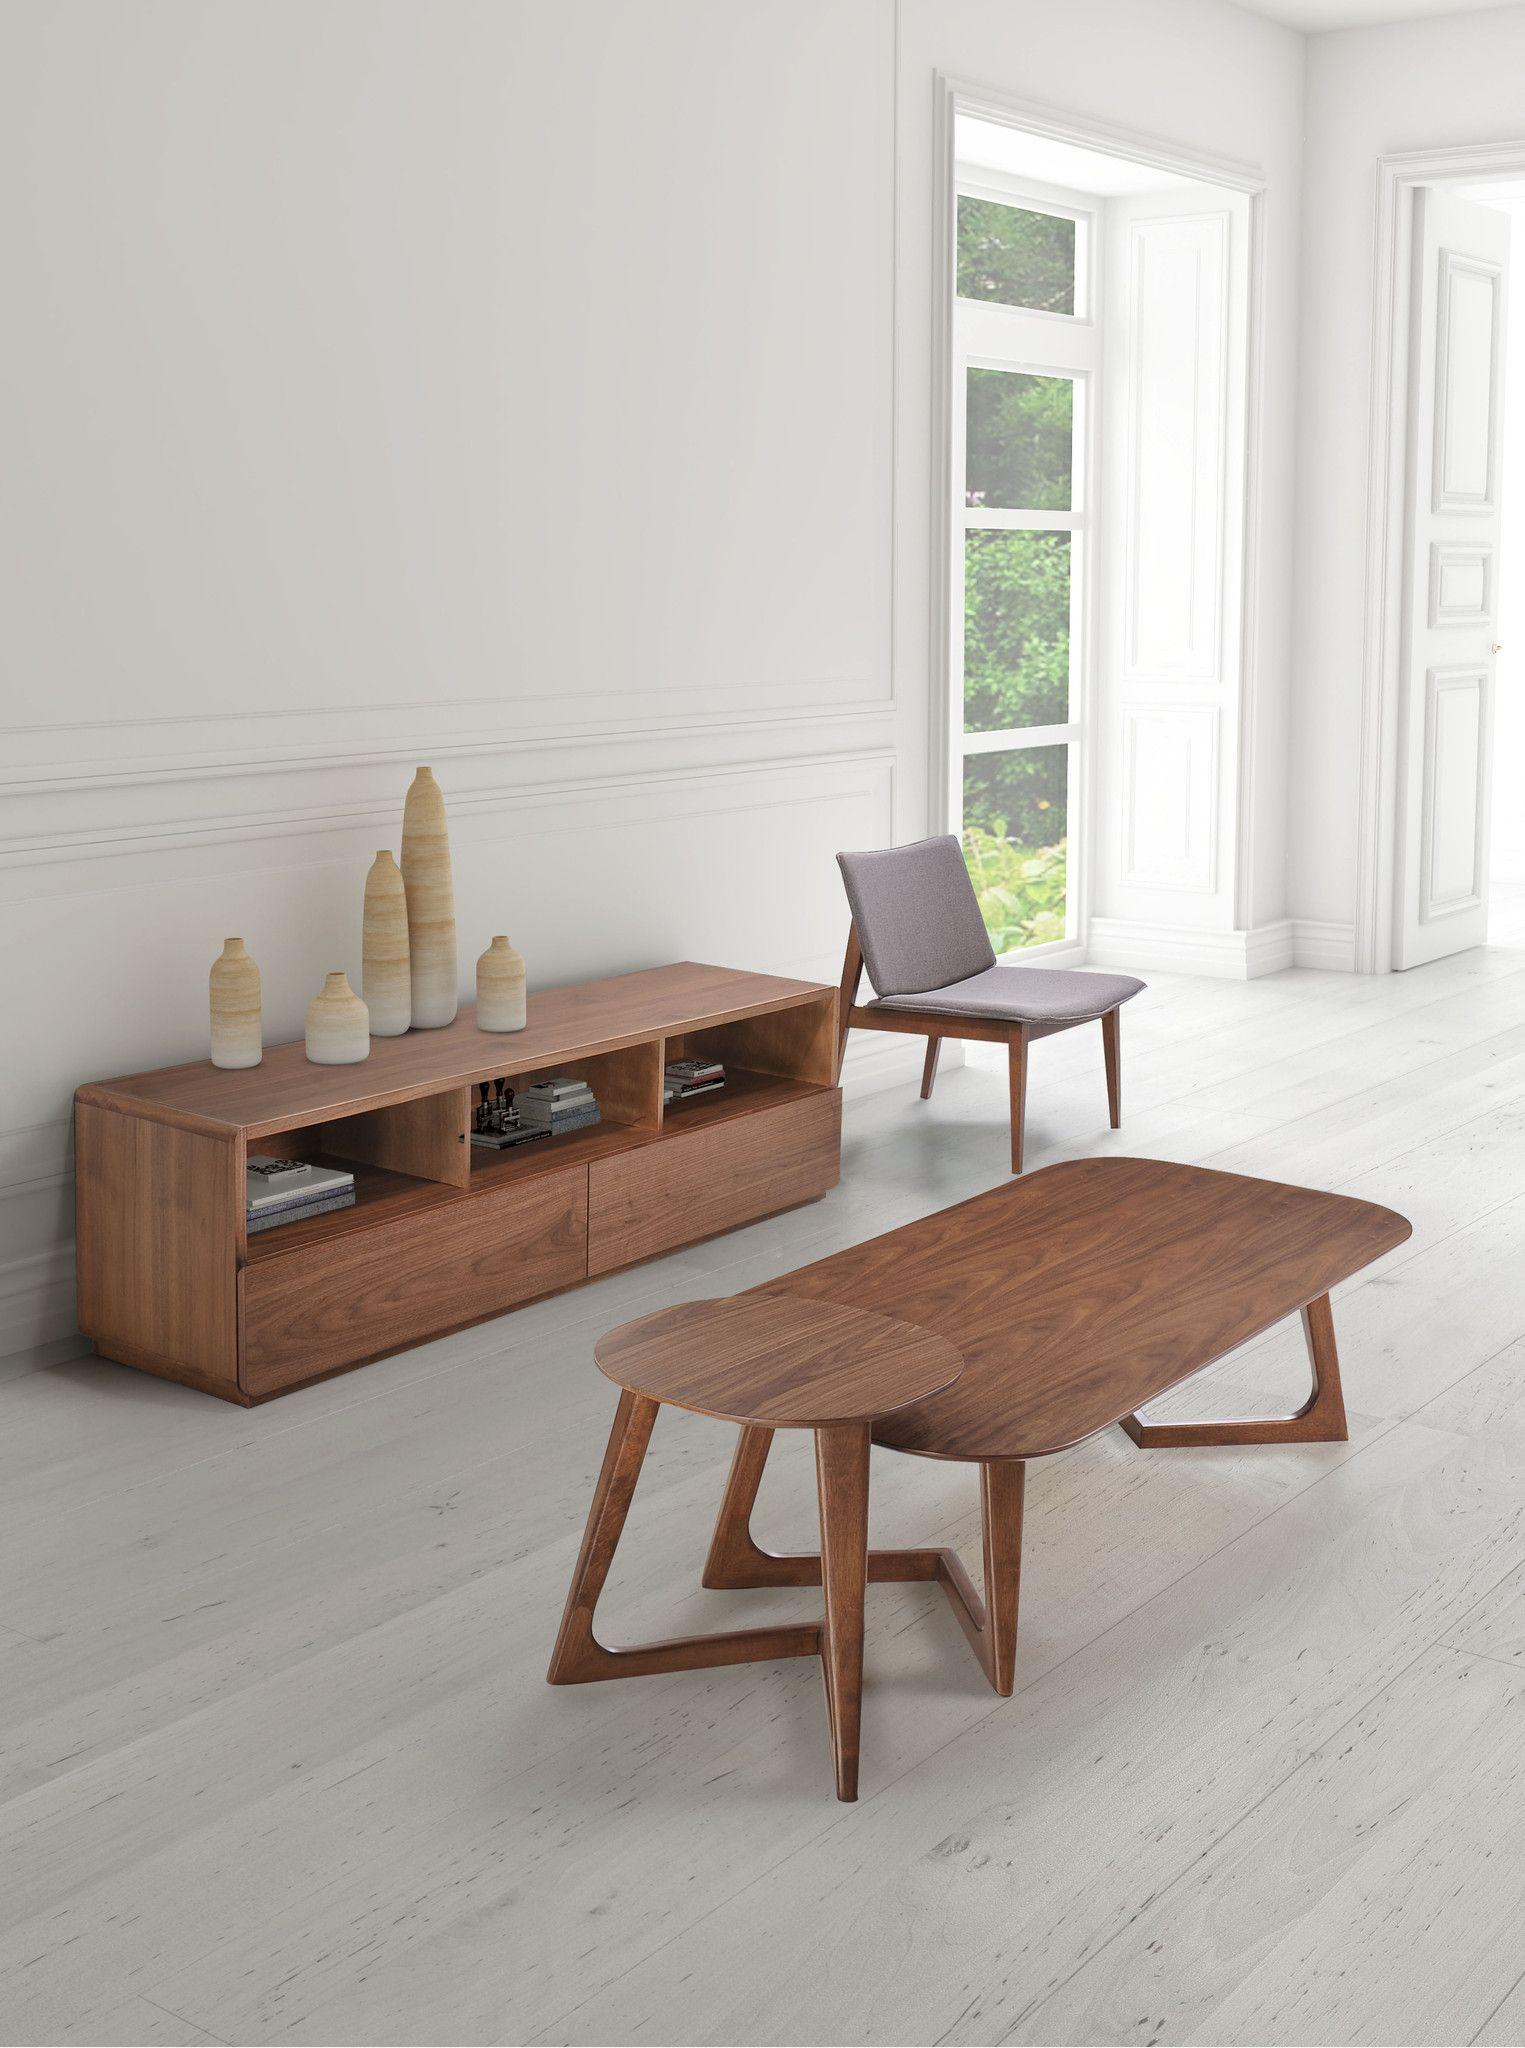 Coffee Table Morris By Kirsi Gullichsen How Come Scandinavian Design Is So Distinctive [ 900 x 900 Pixel ]